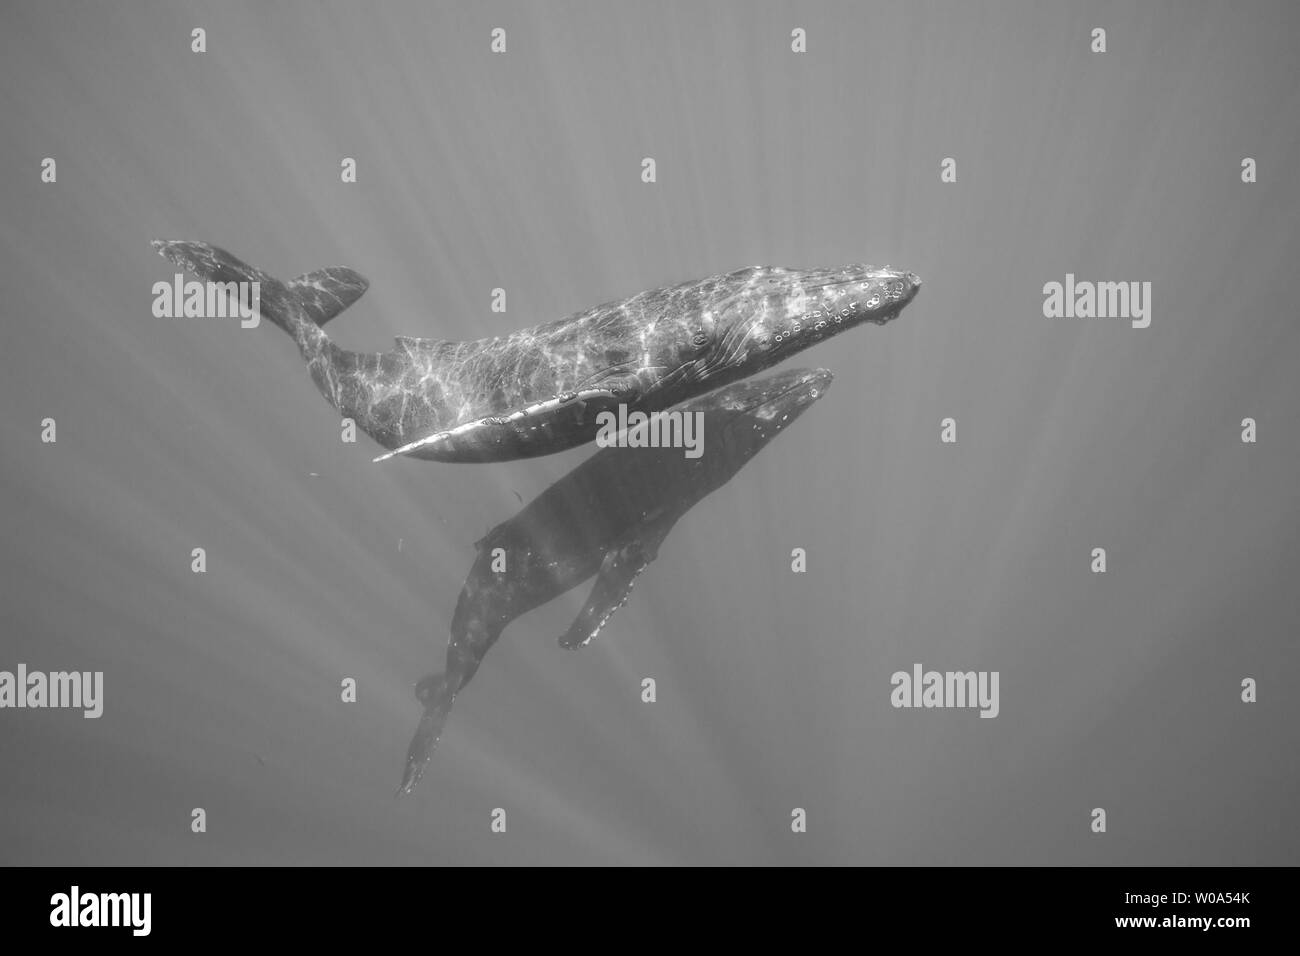 Las ballenas jorobadas Megaptera novaeangliae, submarino, Hawai. Foto de stock